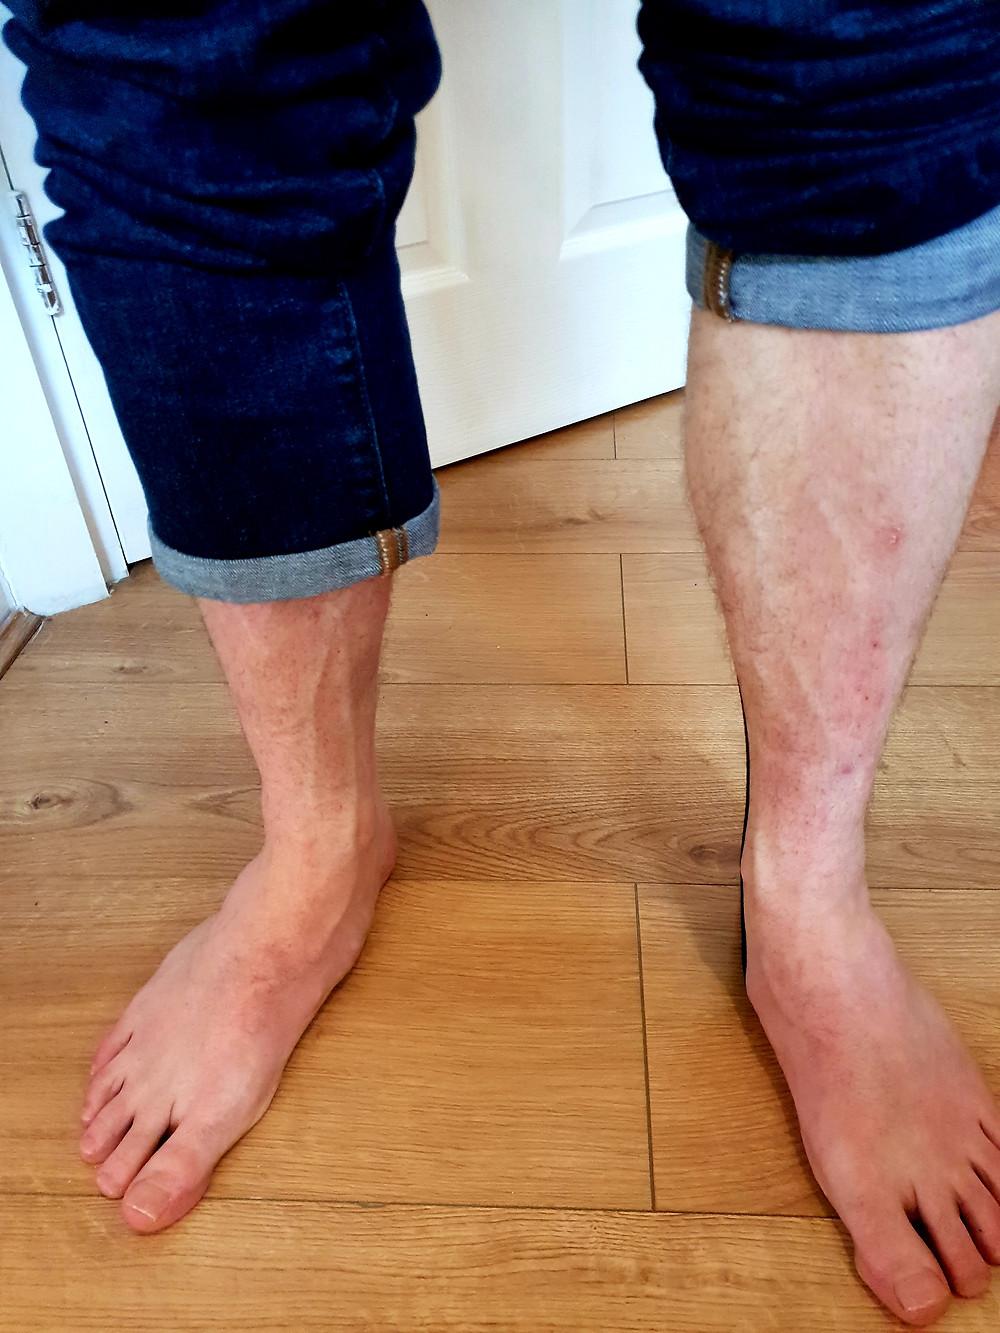 Man showing his feet